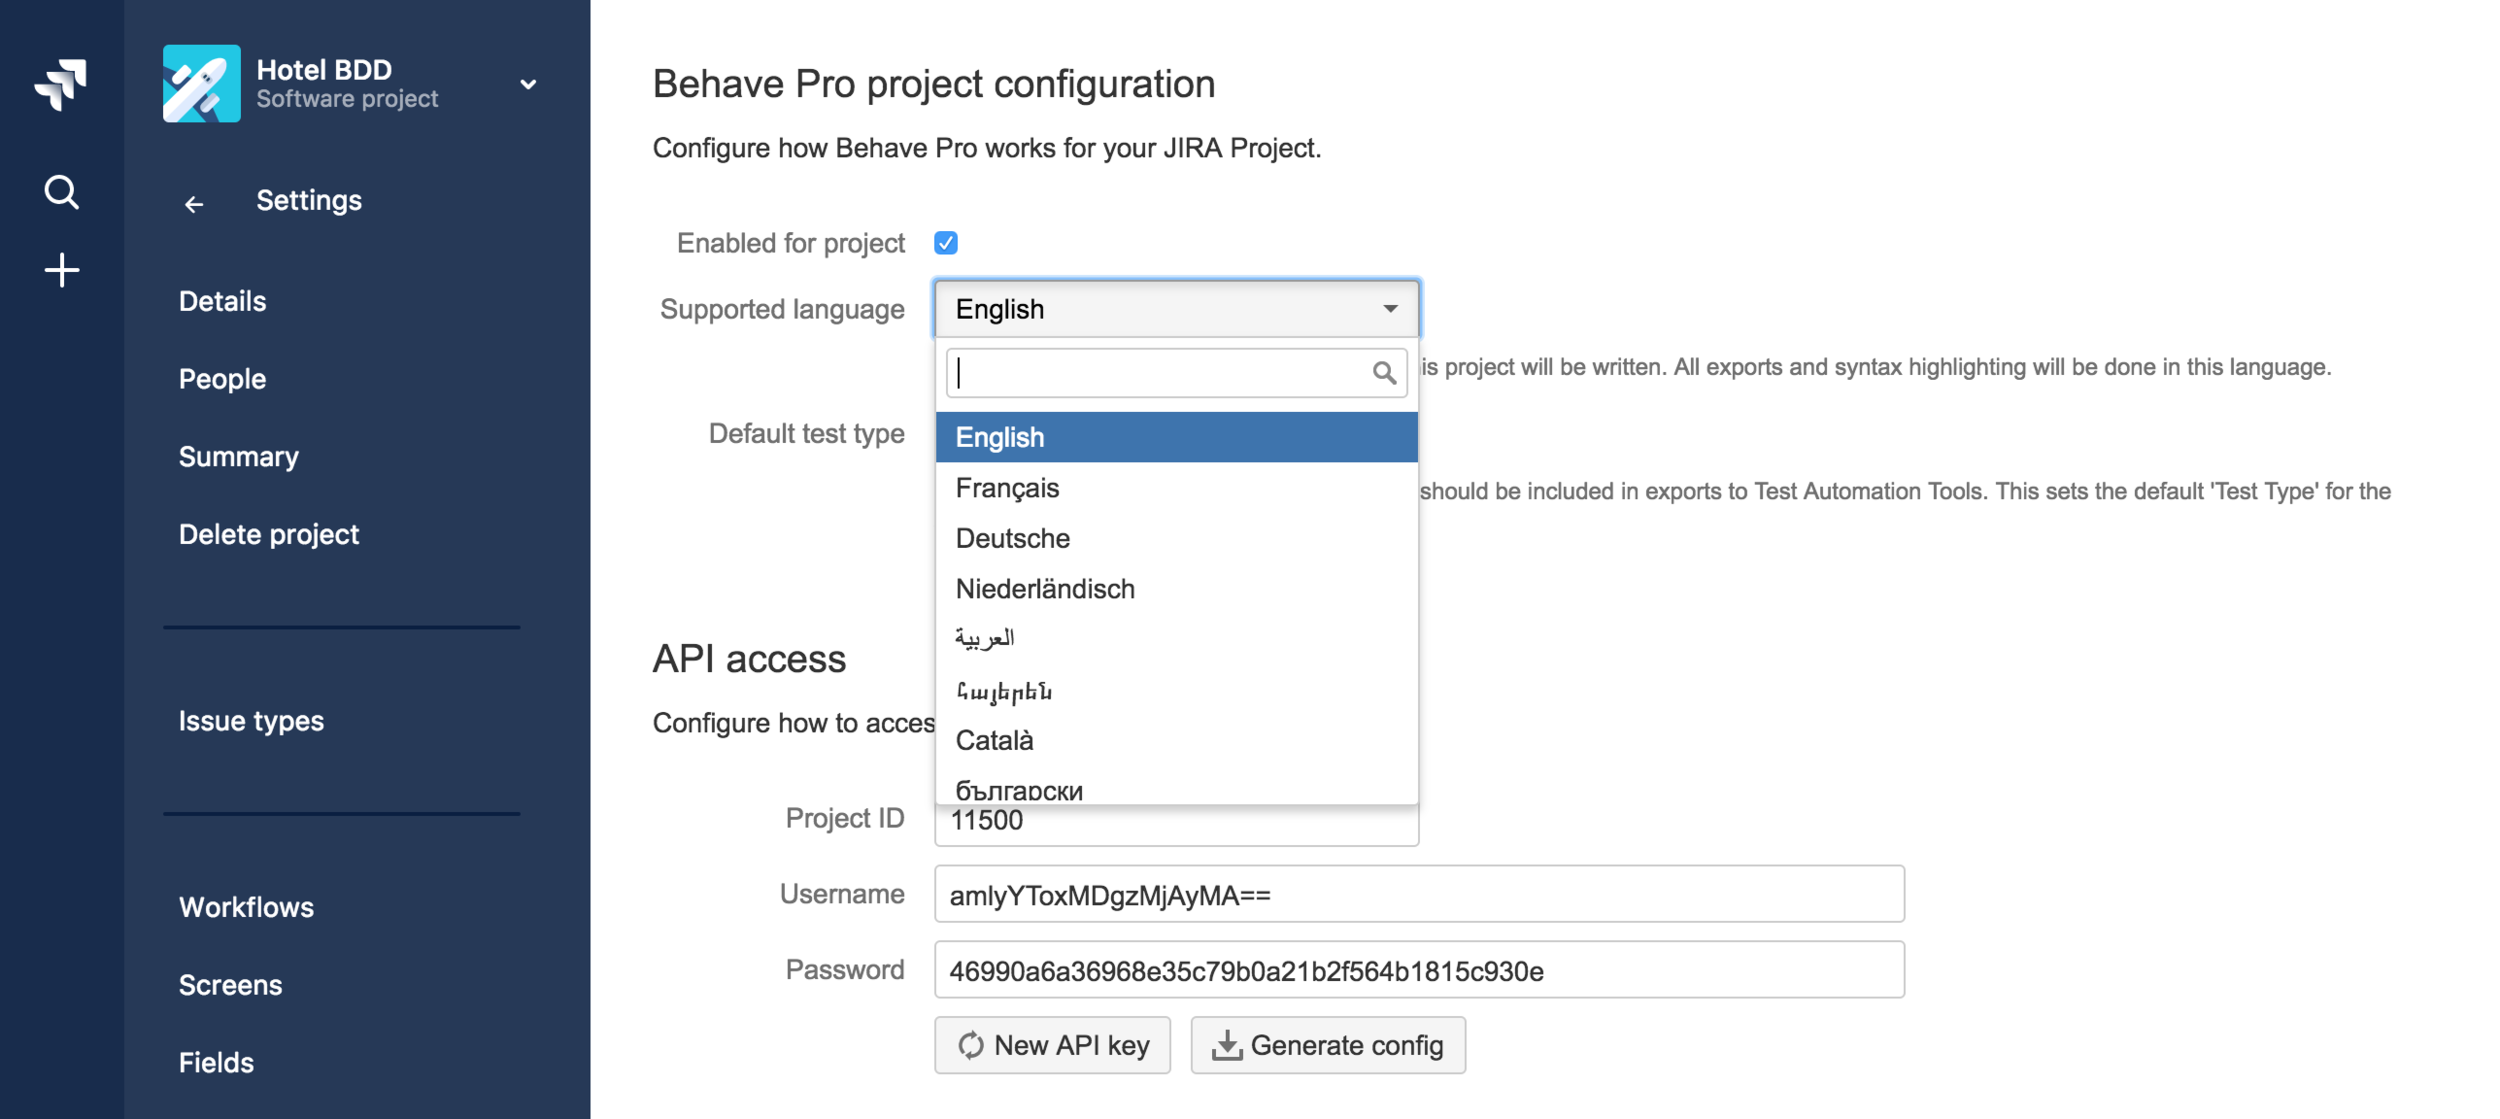 Hindsight Bebave Pro project configuration screenshot